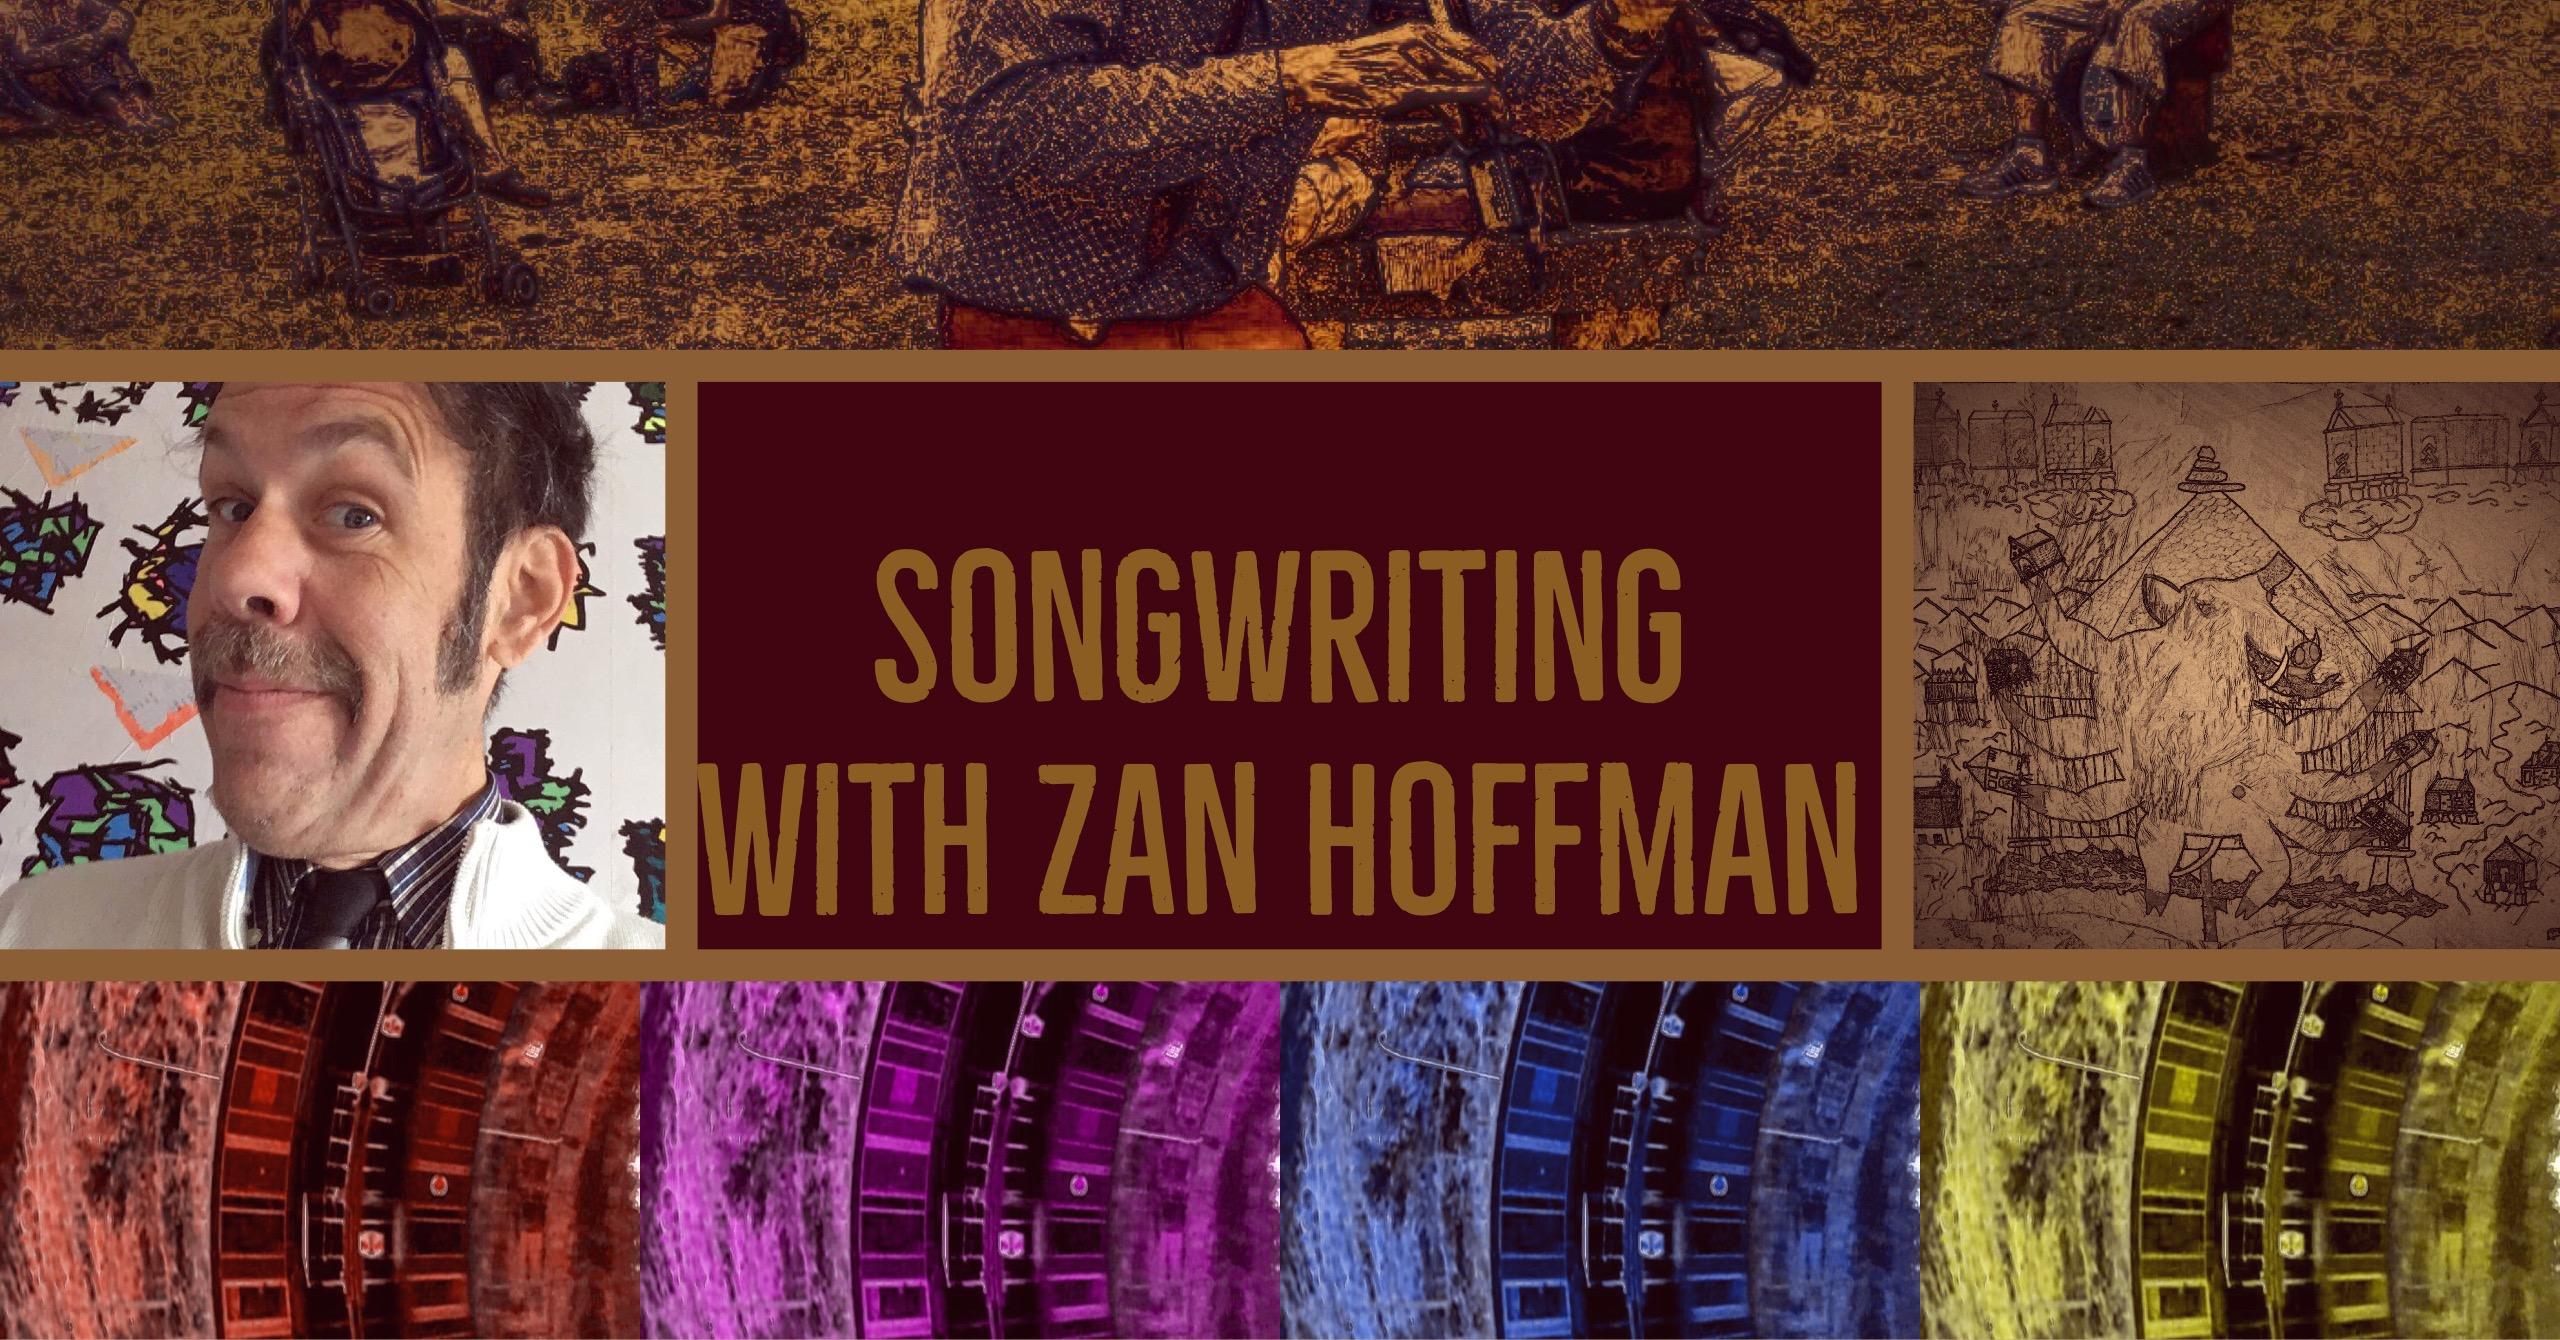 Sound Cycle: Zan Hoffman Songwriting Seminar